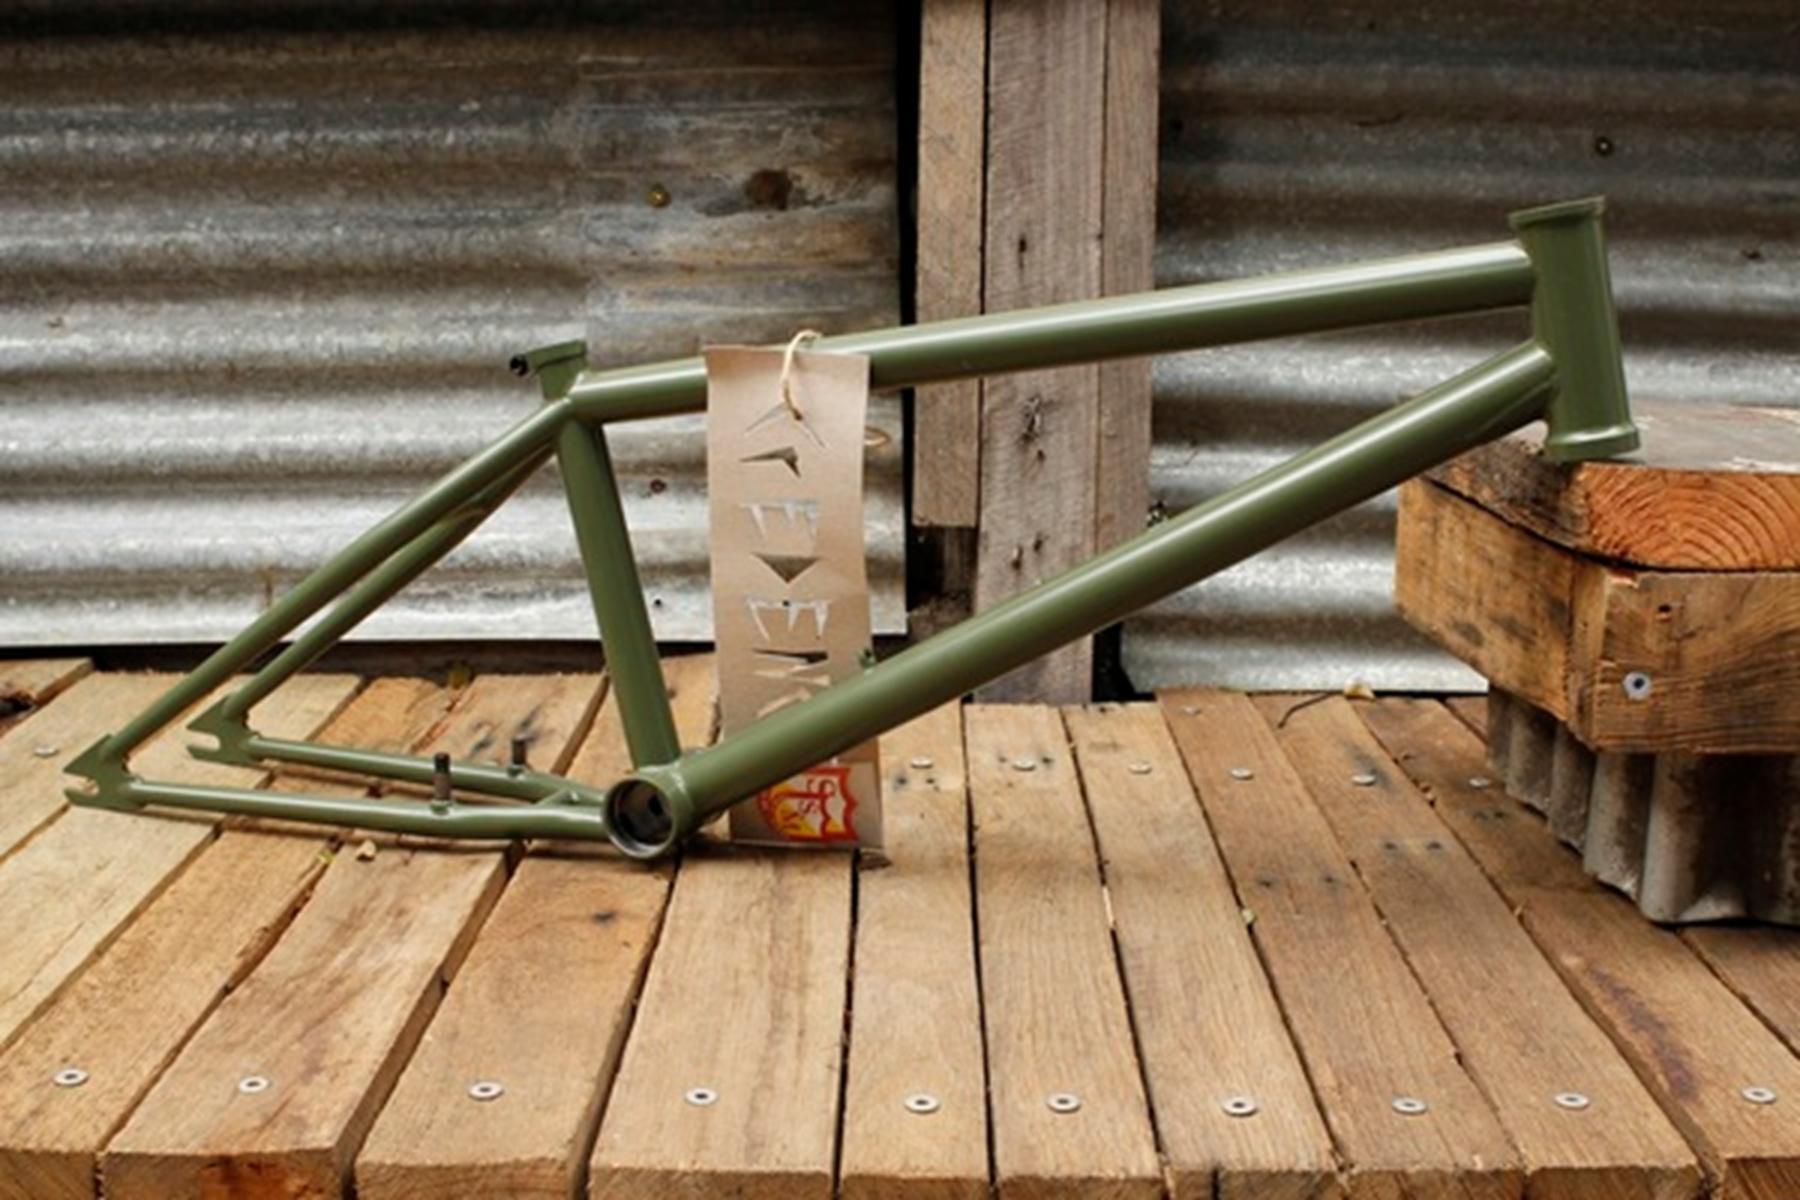 S/&M BIKES REYNOLDS CCR GRIPS ARMY GREEN BMX BIKE GRIP TRAILS CREDENCE